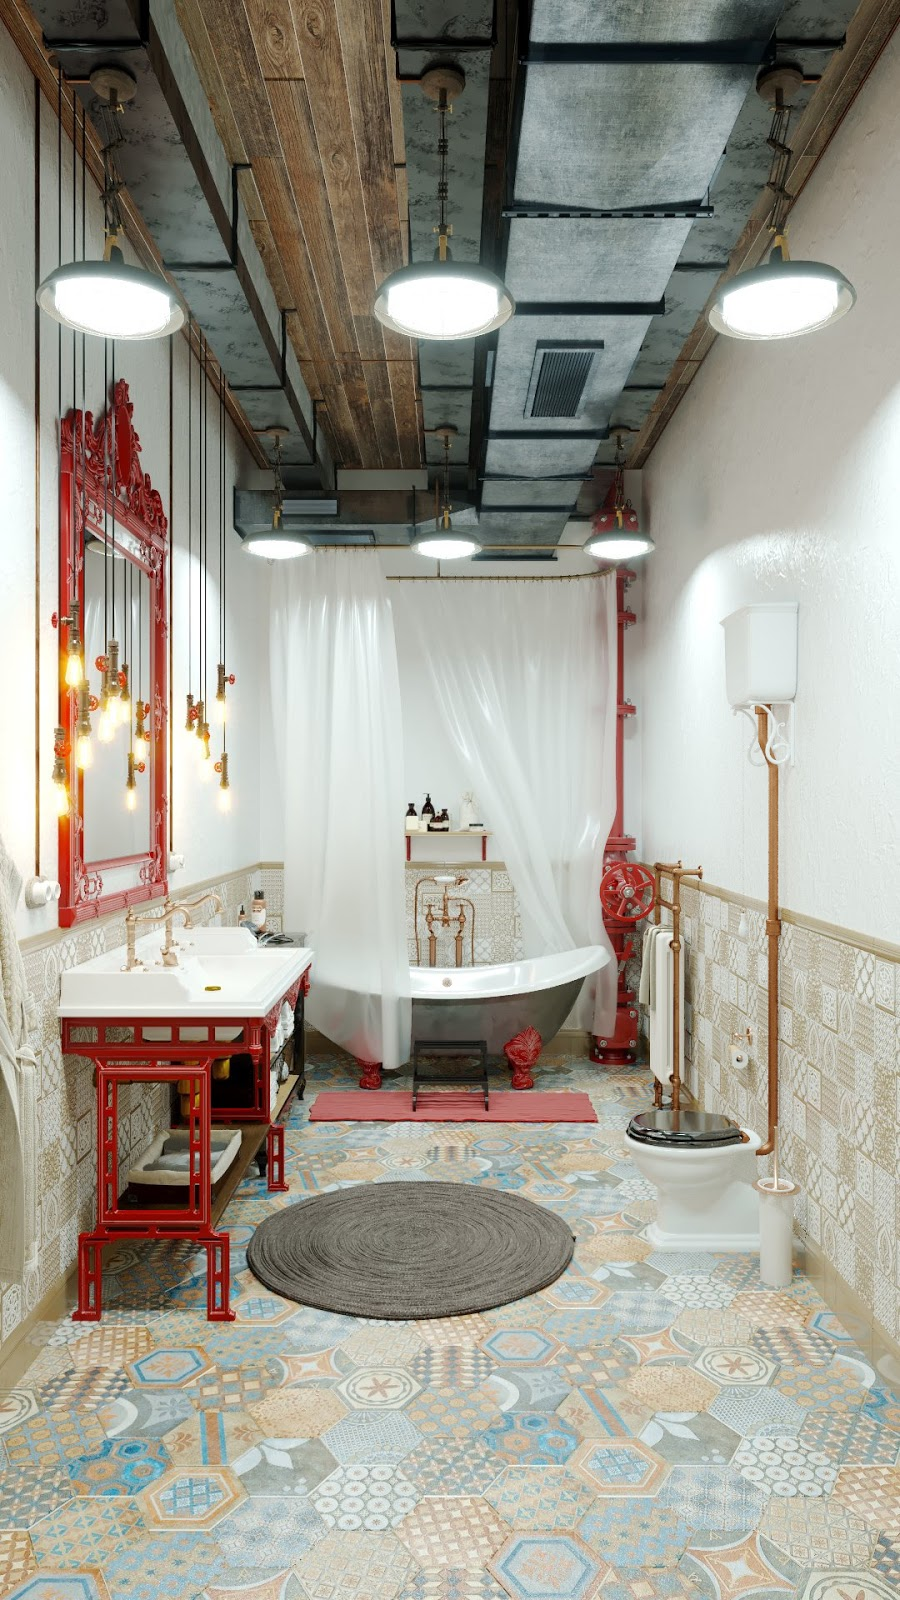 25 Amazing Bathroom Design Ideas - Page 7 of 25 - Home & Garden Sphere